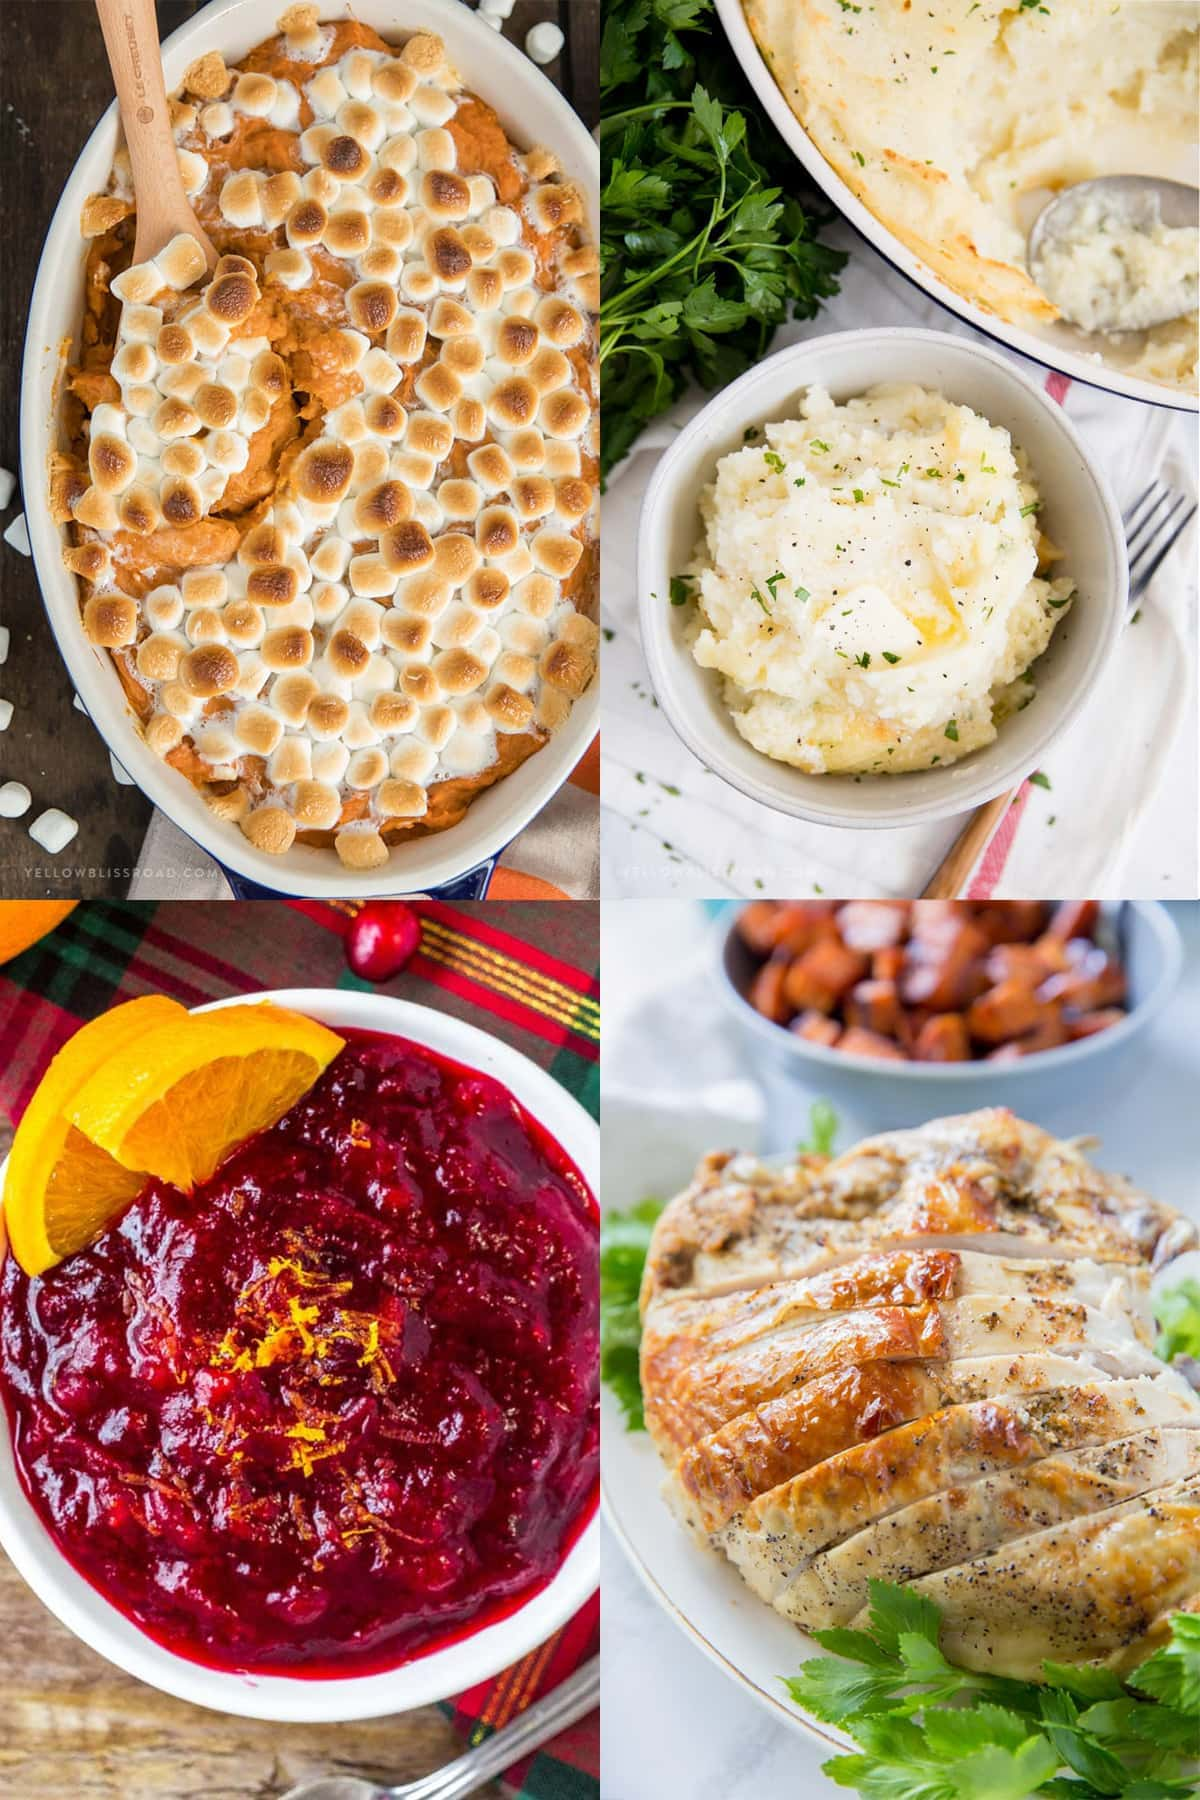 4 image collage of sweet potato casserole, mashed potatoes, cranberry sauce, roasted turkey breast